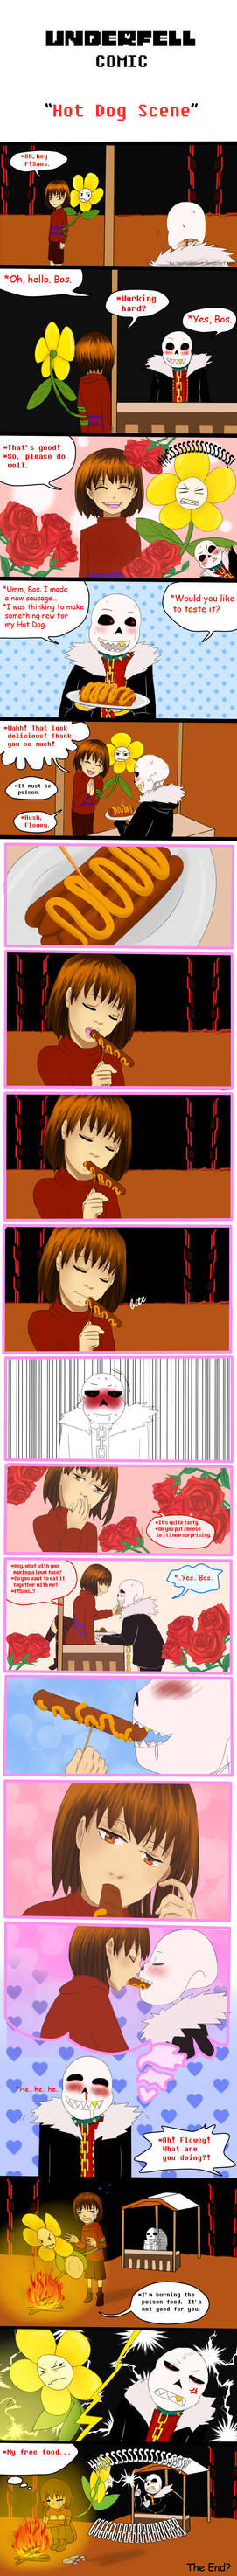 Underfell Comic: Hot Dog Scene